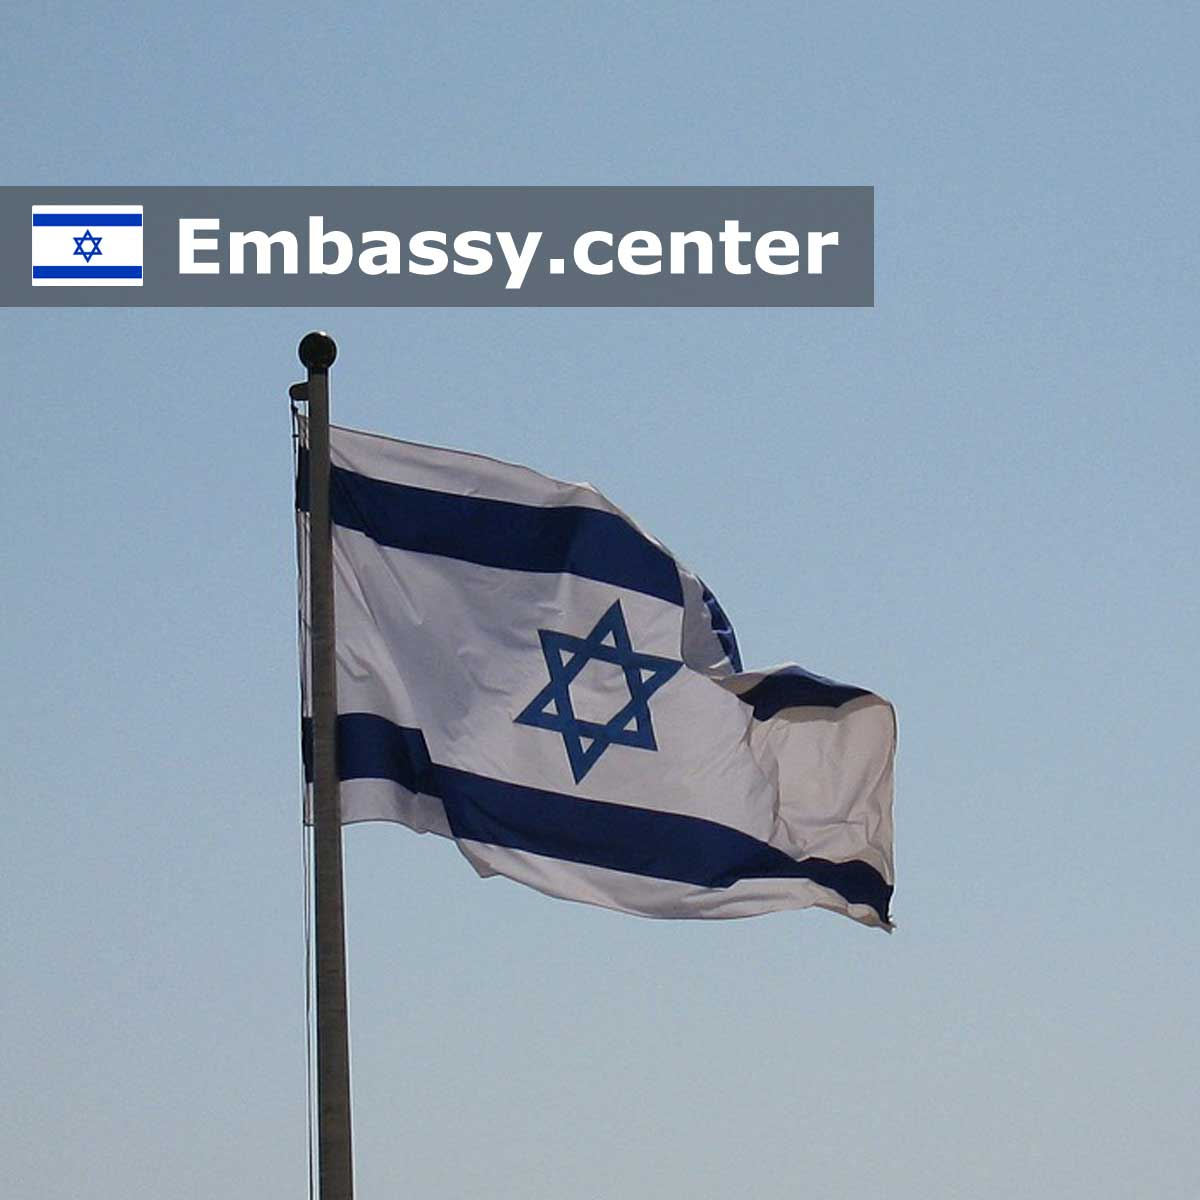 Honorary Consulate of Israel in Lviv, Ukraine - www embassy center